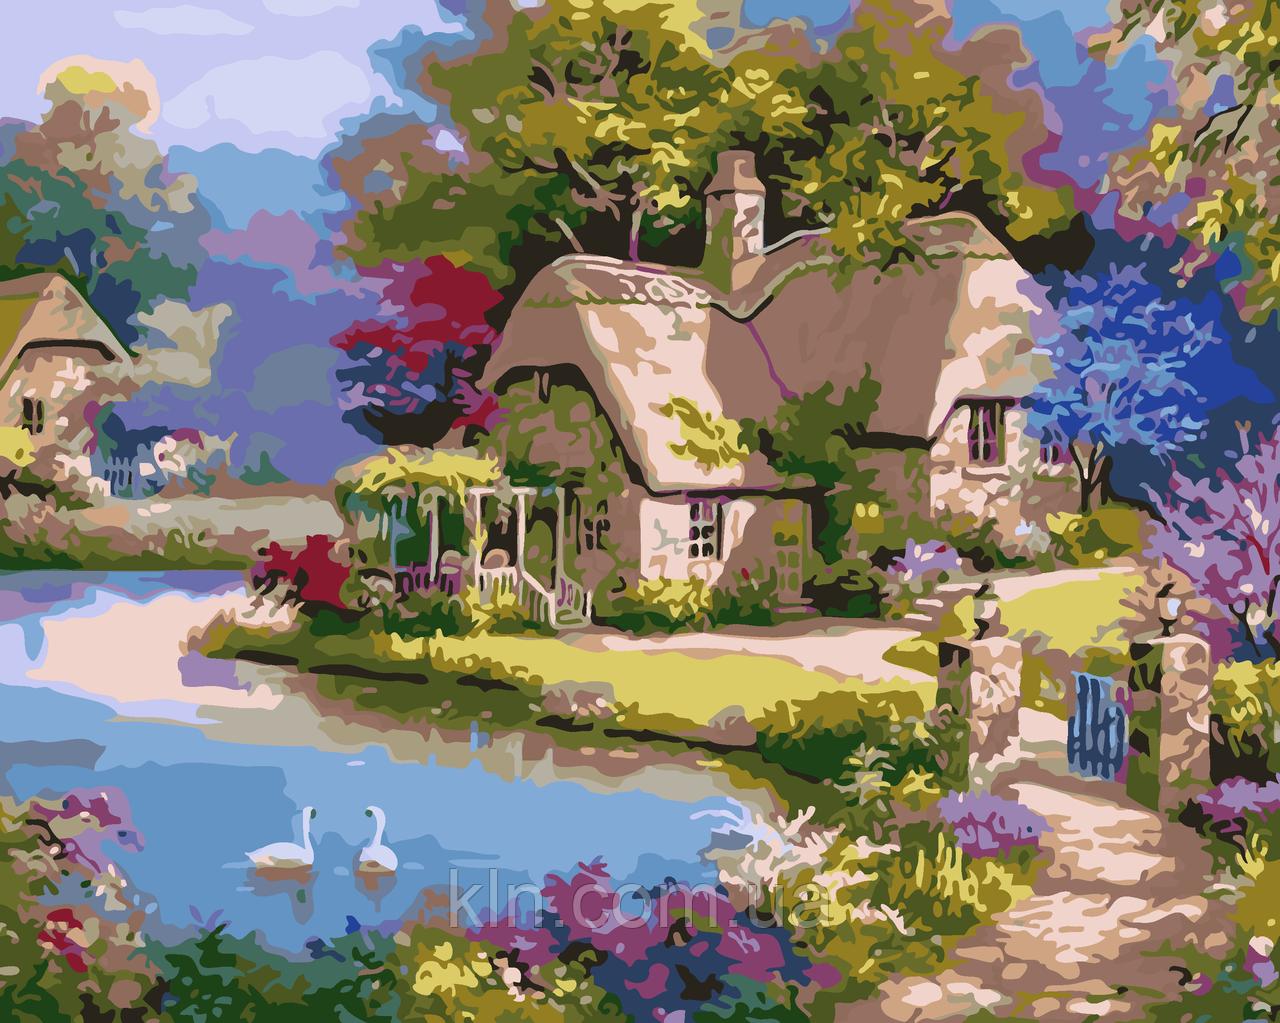 Картина по номерам ArtStory Уютный уголок 40 х 50 см (арт. AS0029)